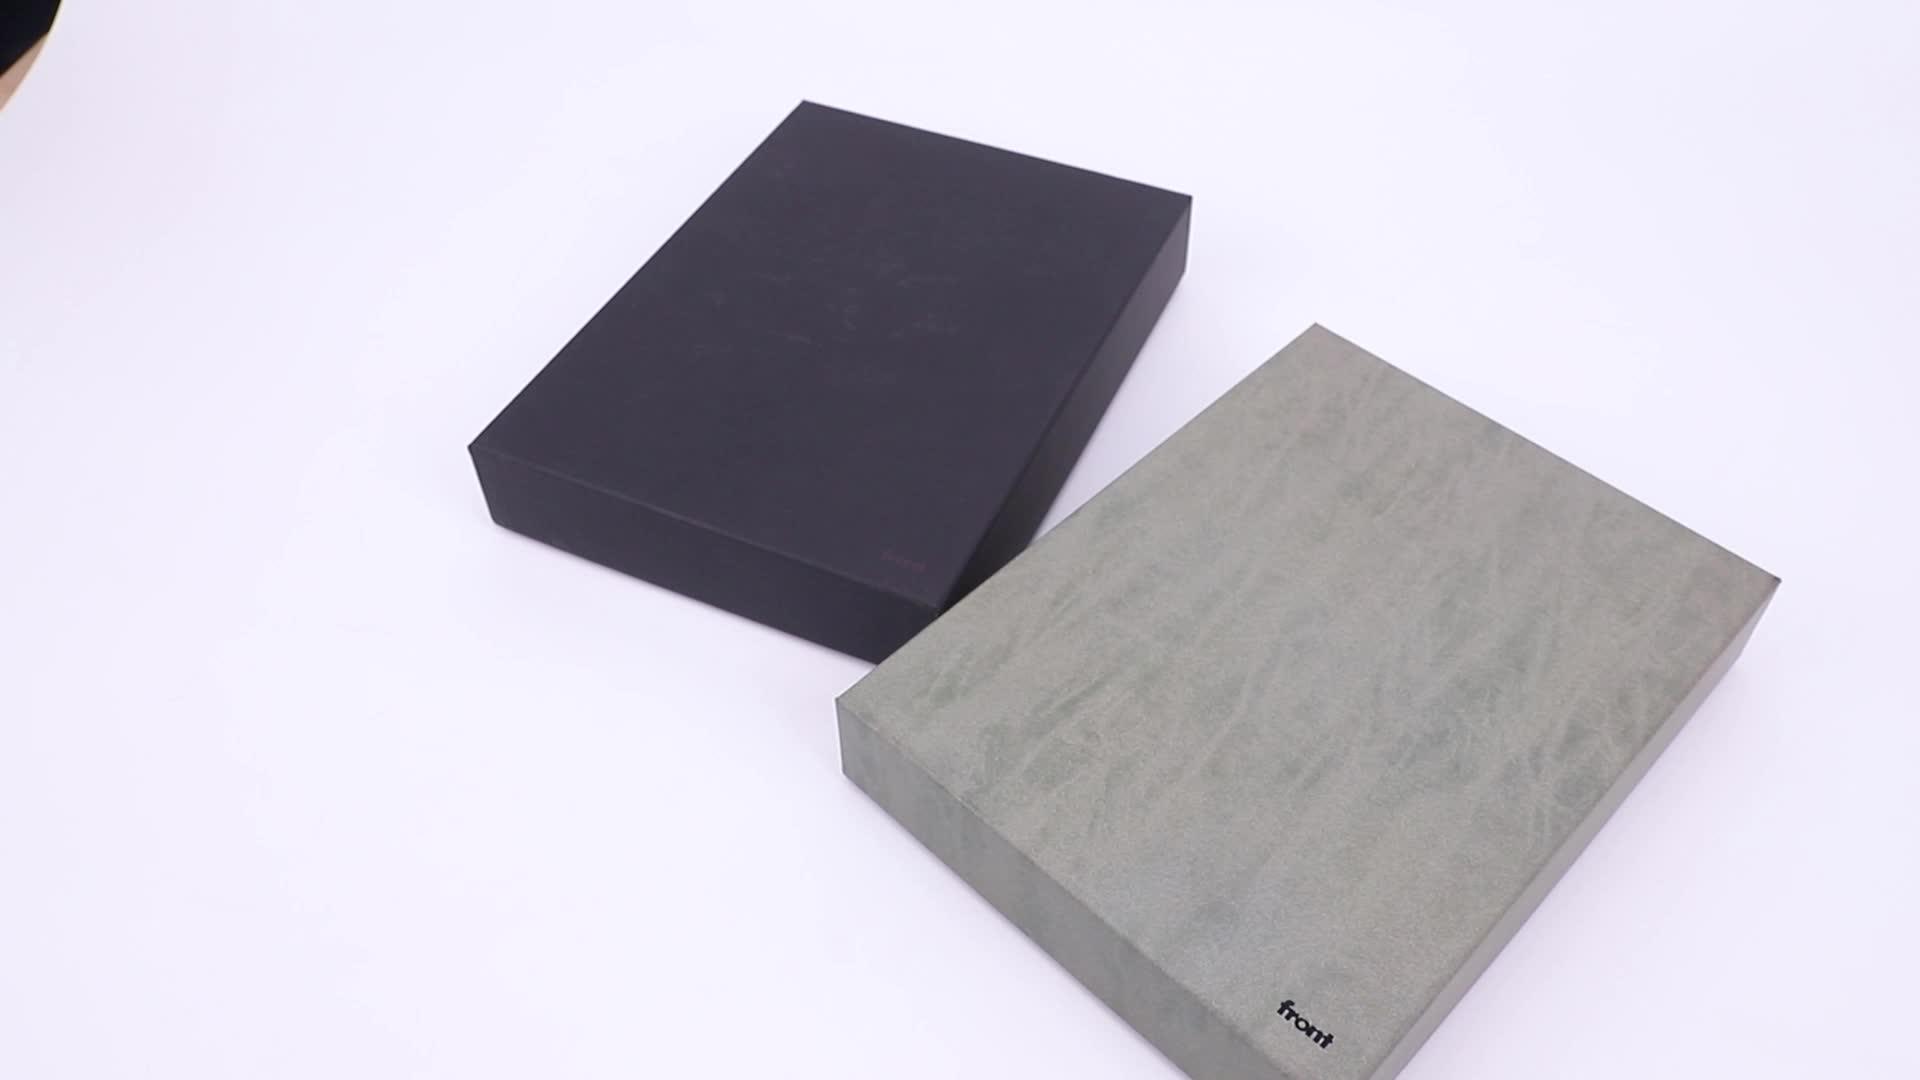 Black journal custom printed hard cover travel grid usadas paper notebook set with powerbank